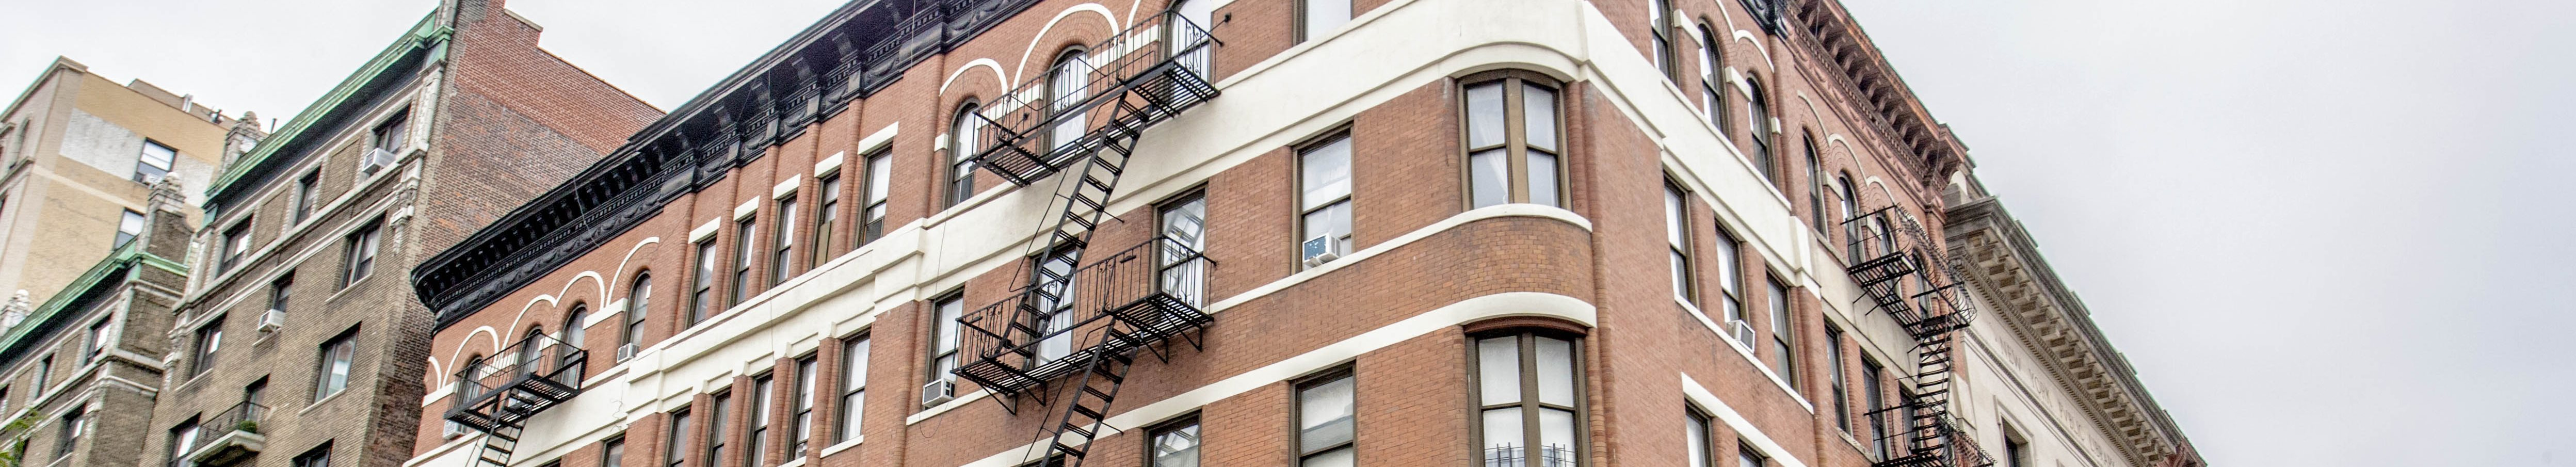 Exterior Photo of 201 West 81st Street, New York, NY 10024